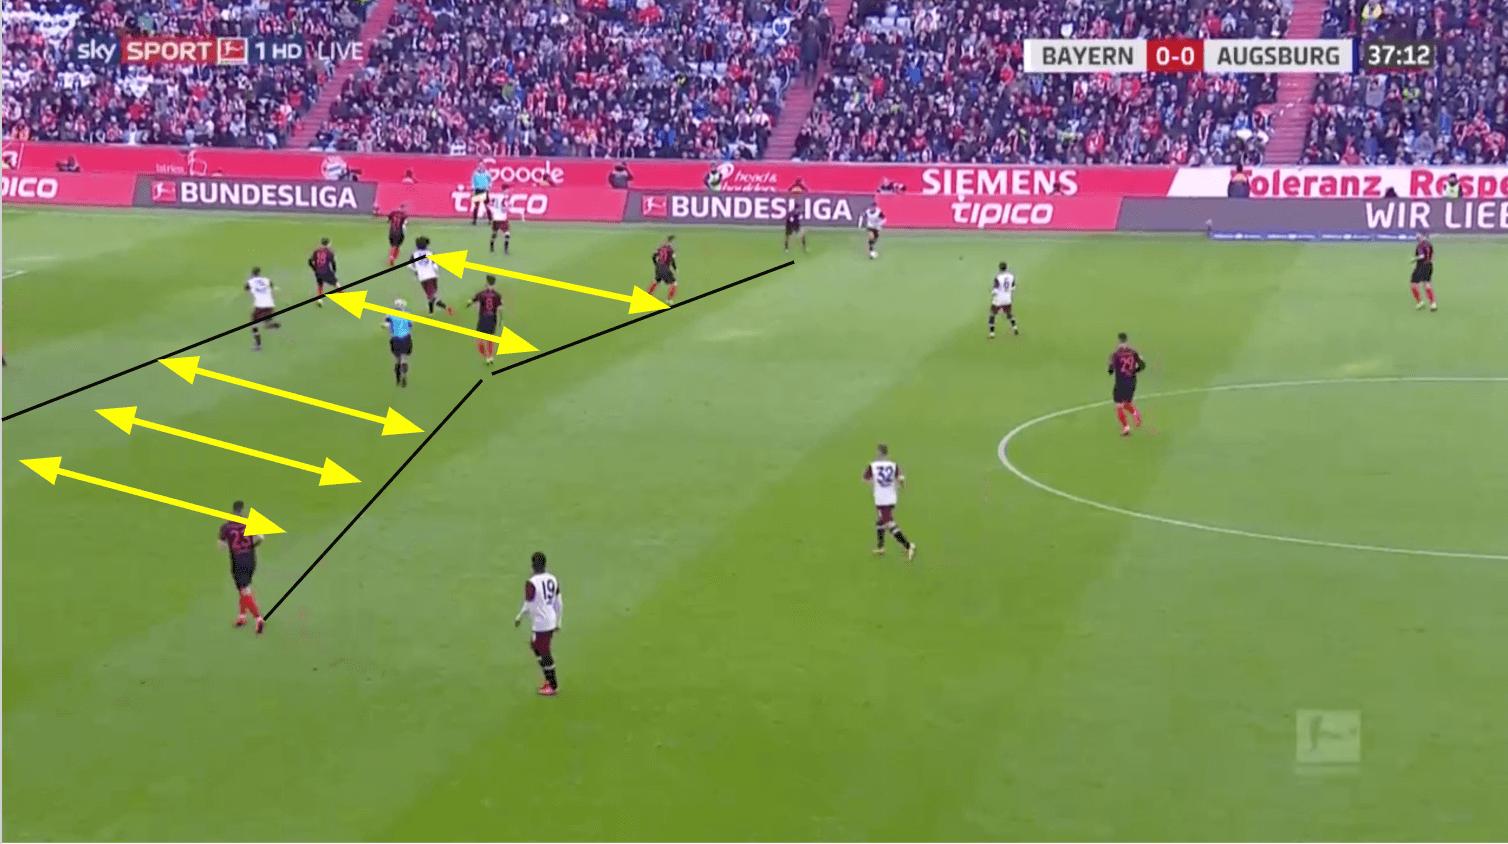 Bundesliga 19/20: Bayern Munich vs FC Augsburg - tactical analysis tactics